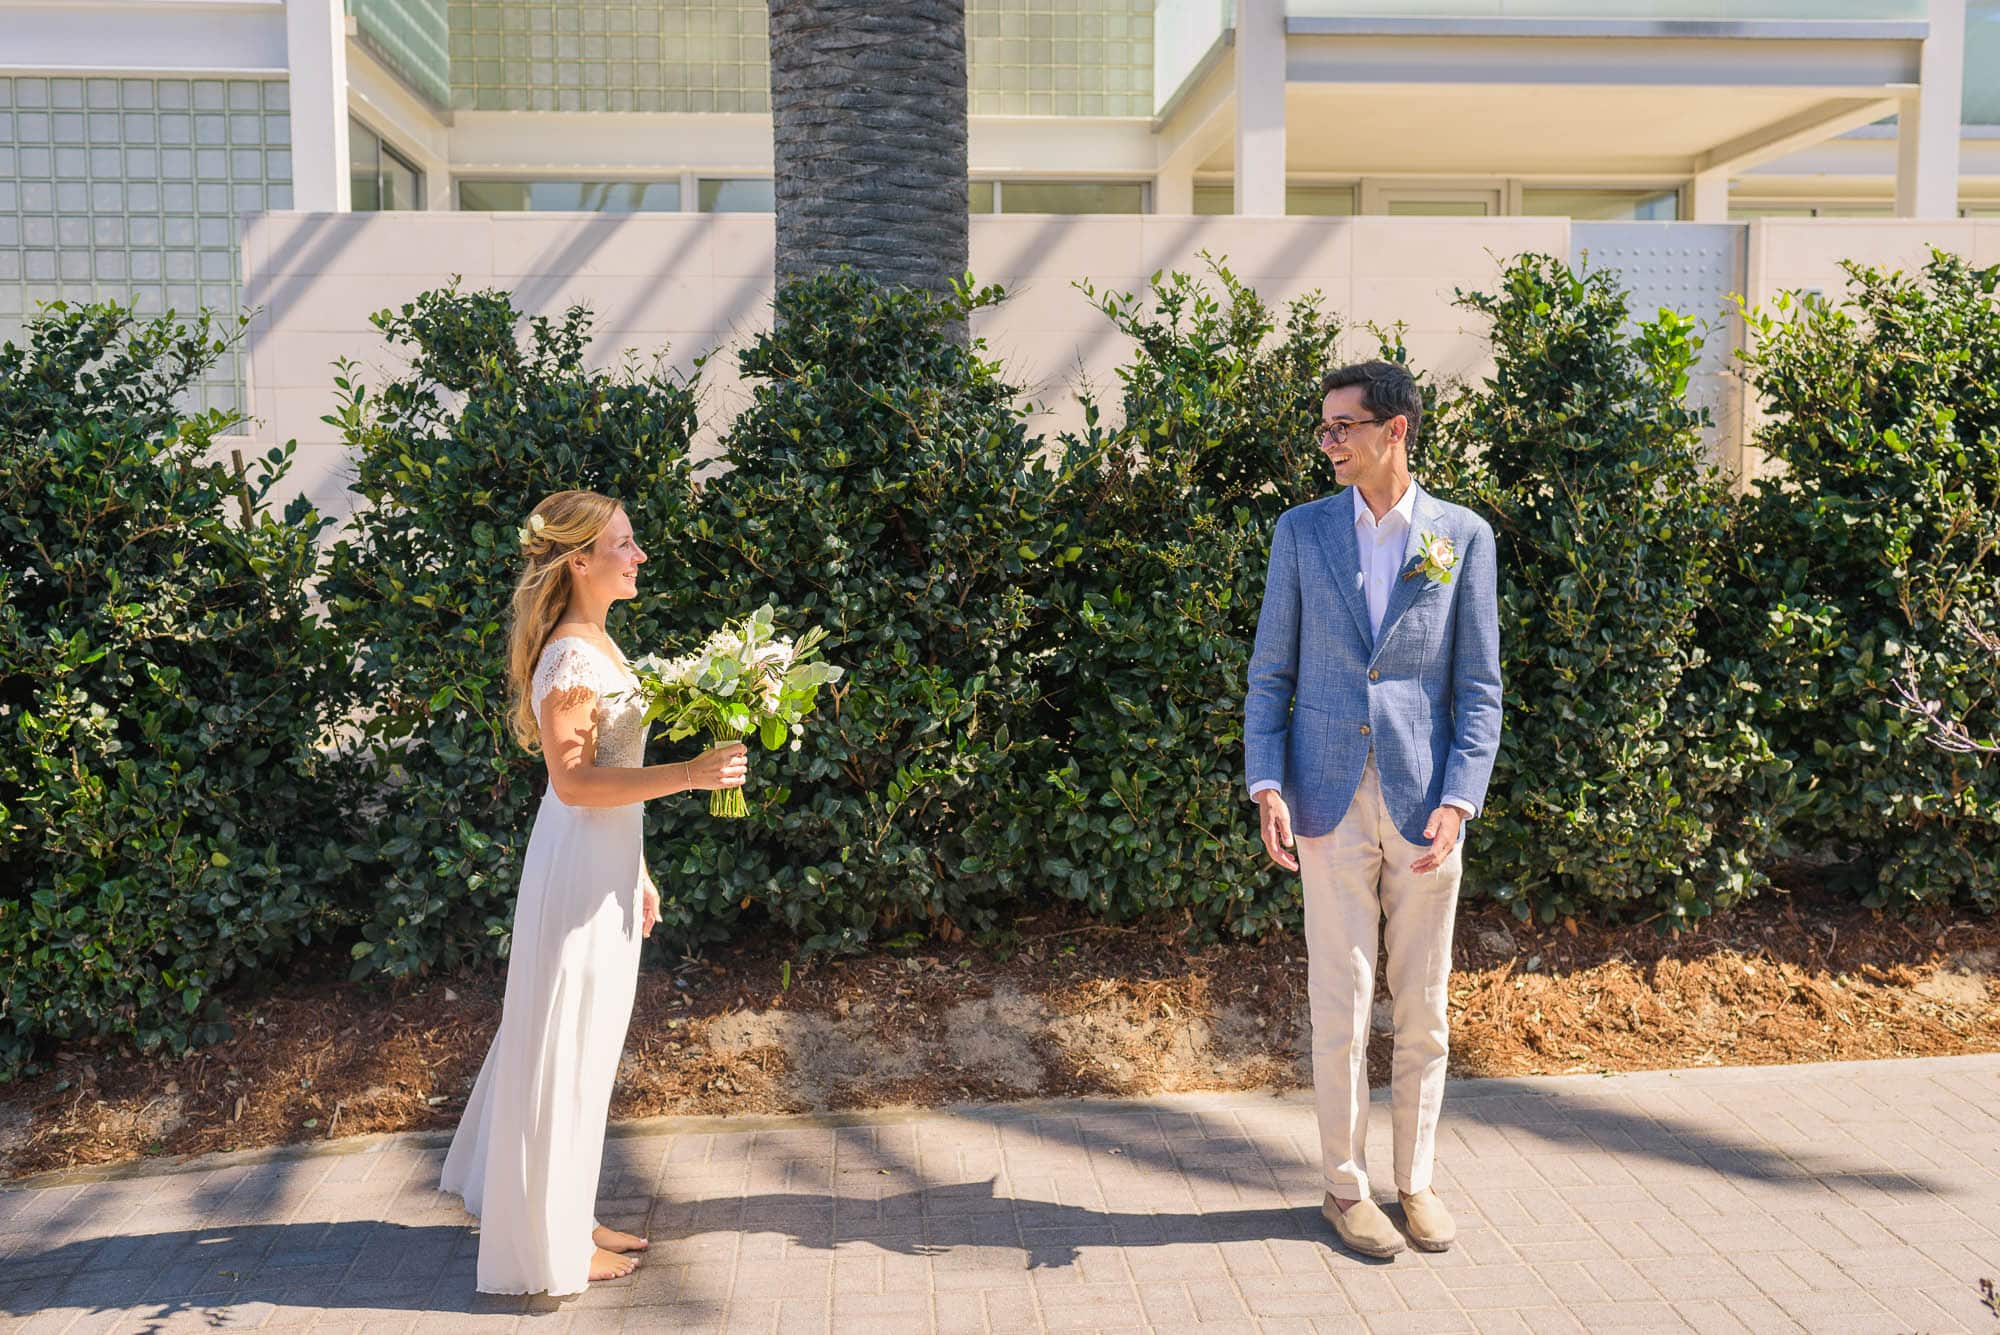 010_Alan_and_Heidi_Wedding_Verena_Andreas